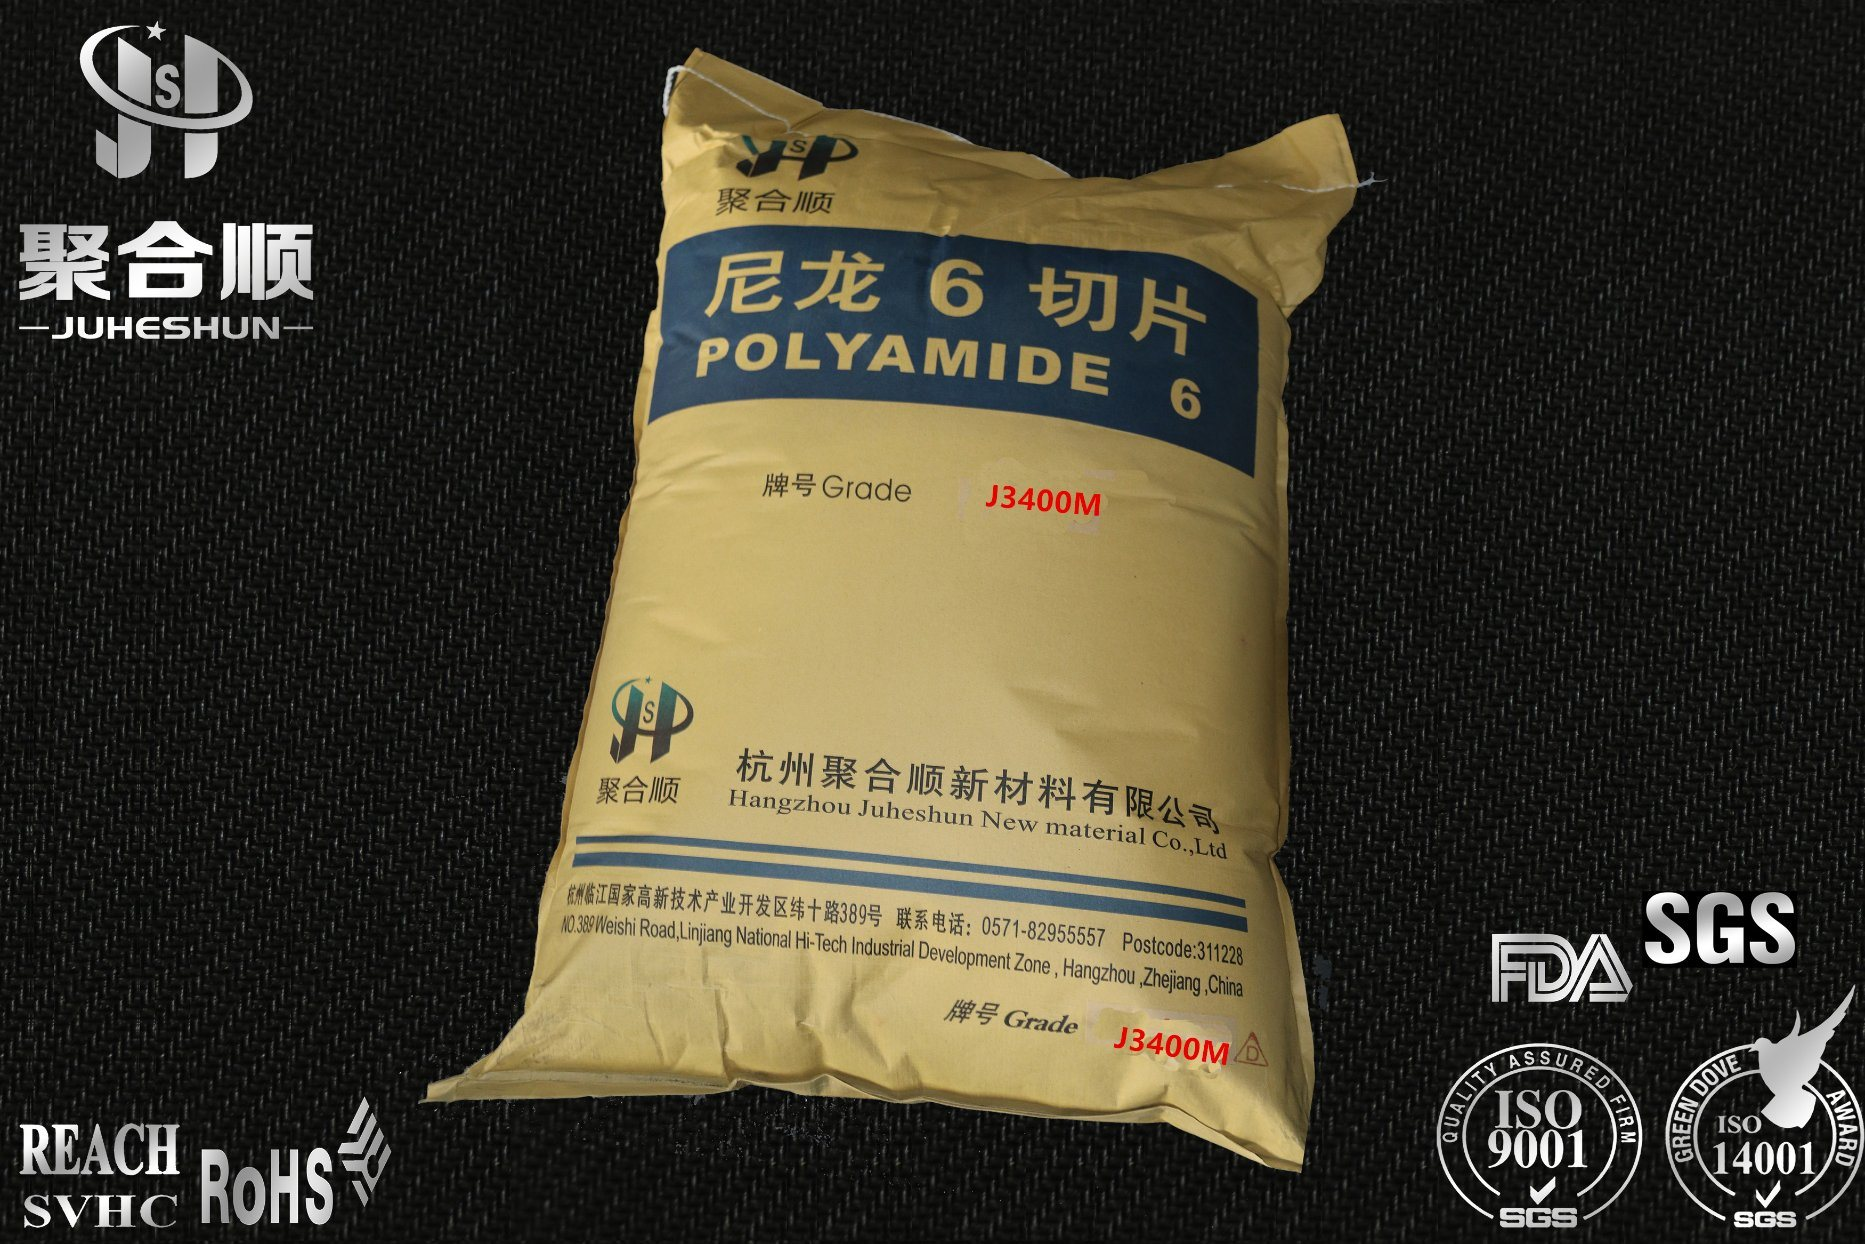 J3400m/Film Grade Nylon 6 Chips/Polyamide 6/Granules/Pellets/Plastic Raw Material/PA6/Nylon6